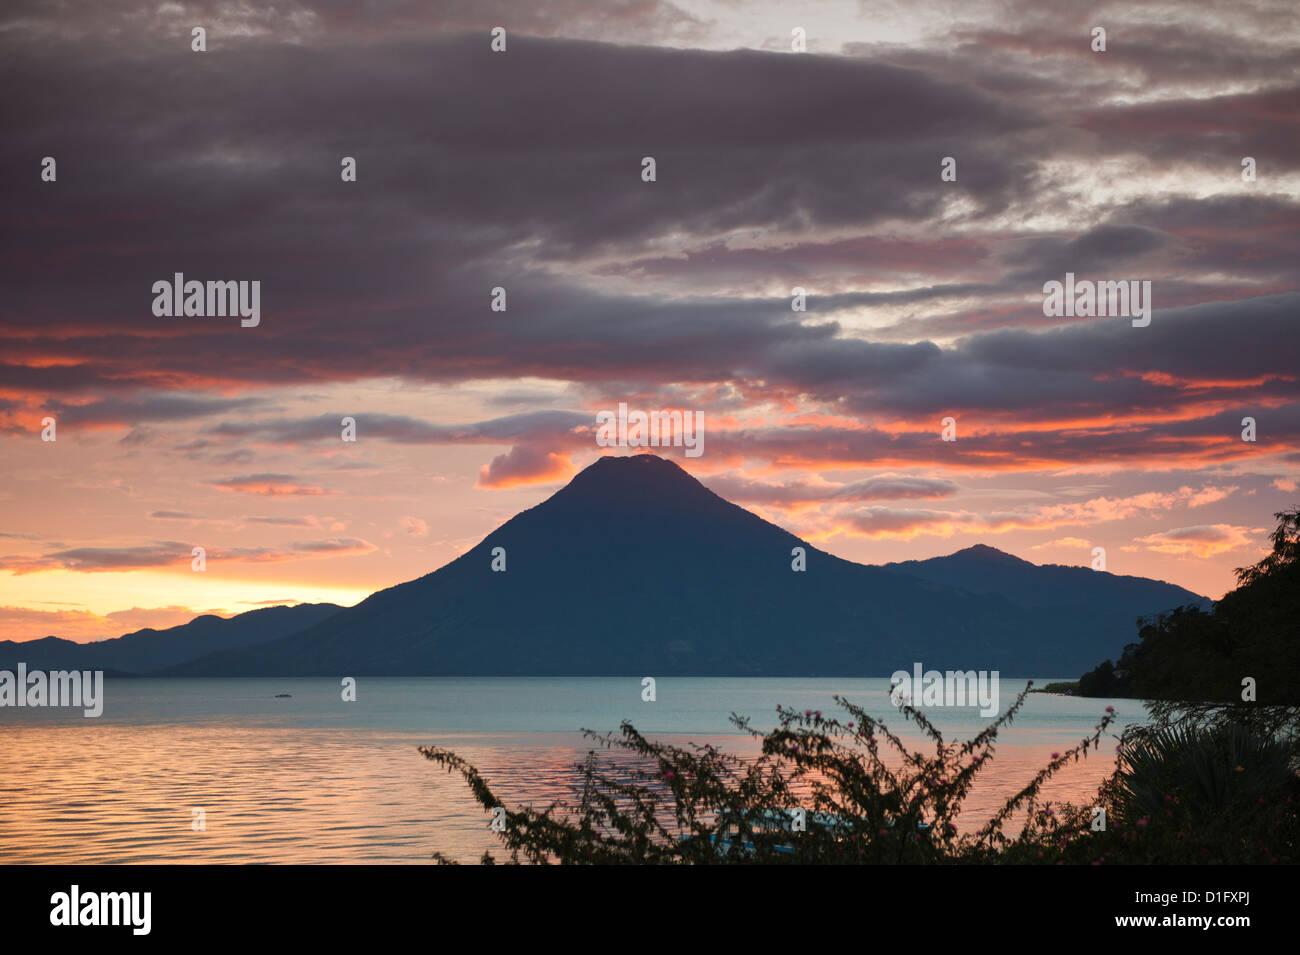 Toliman volcano, Lago de Atitlan, Guatemala, Central America - Stock Image